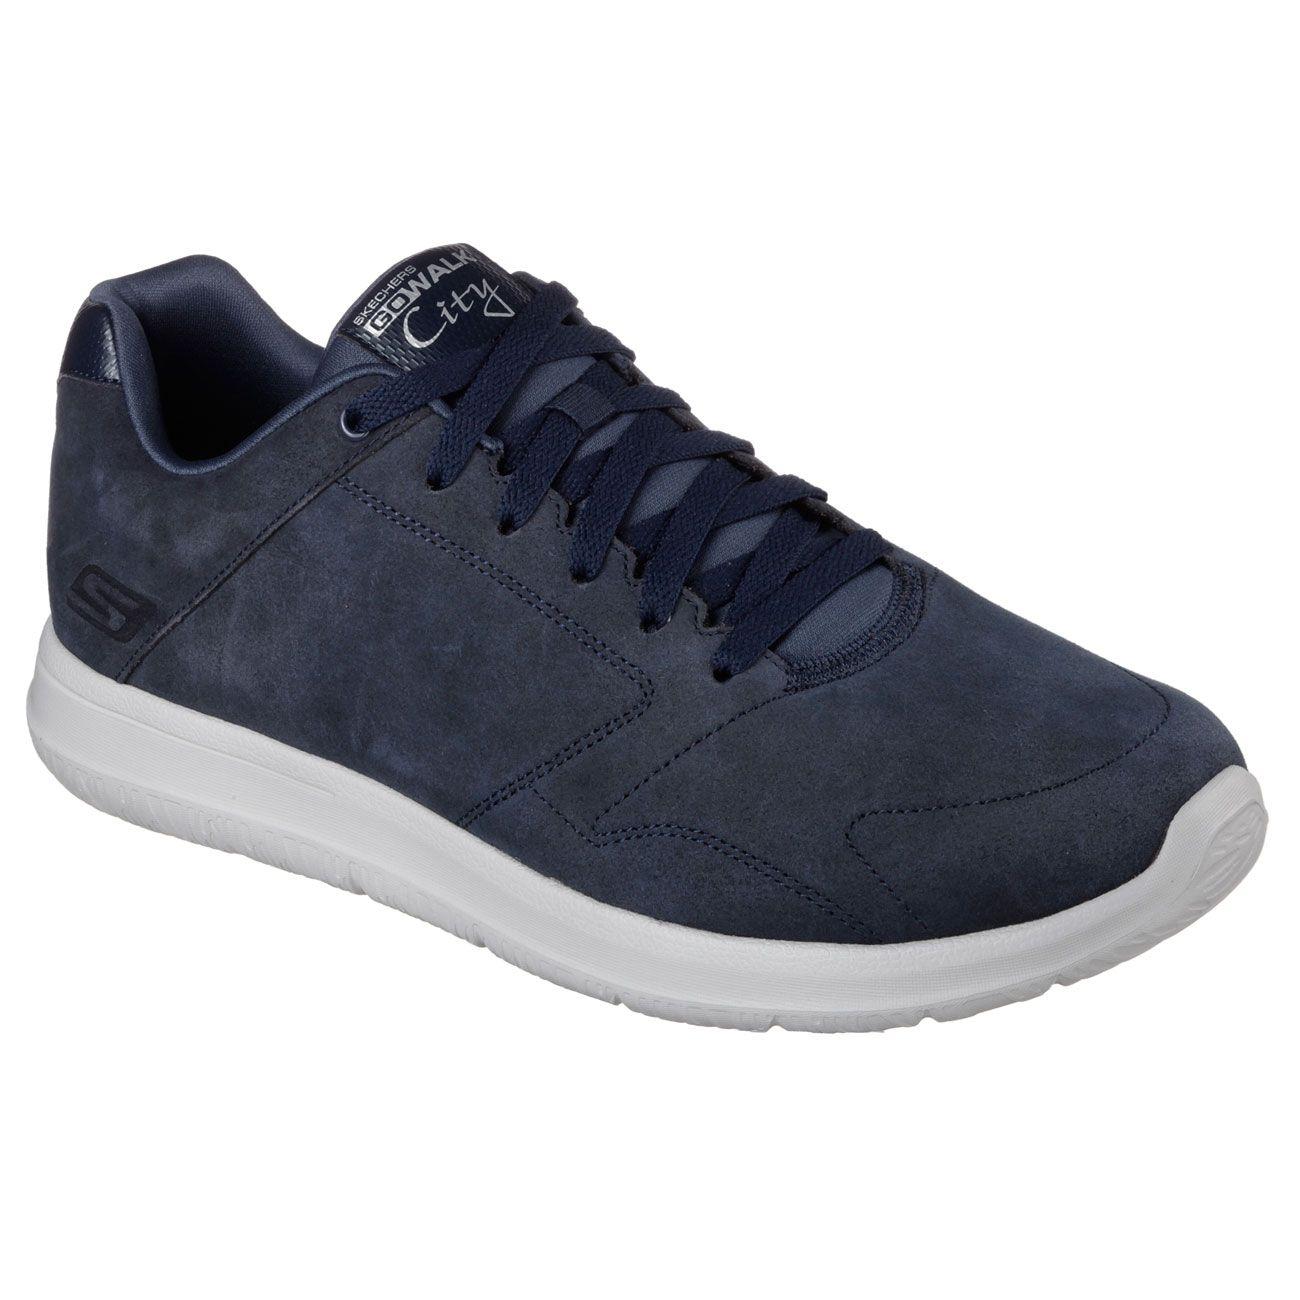 Skechers Mens Walking Shoes Review